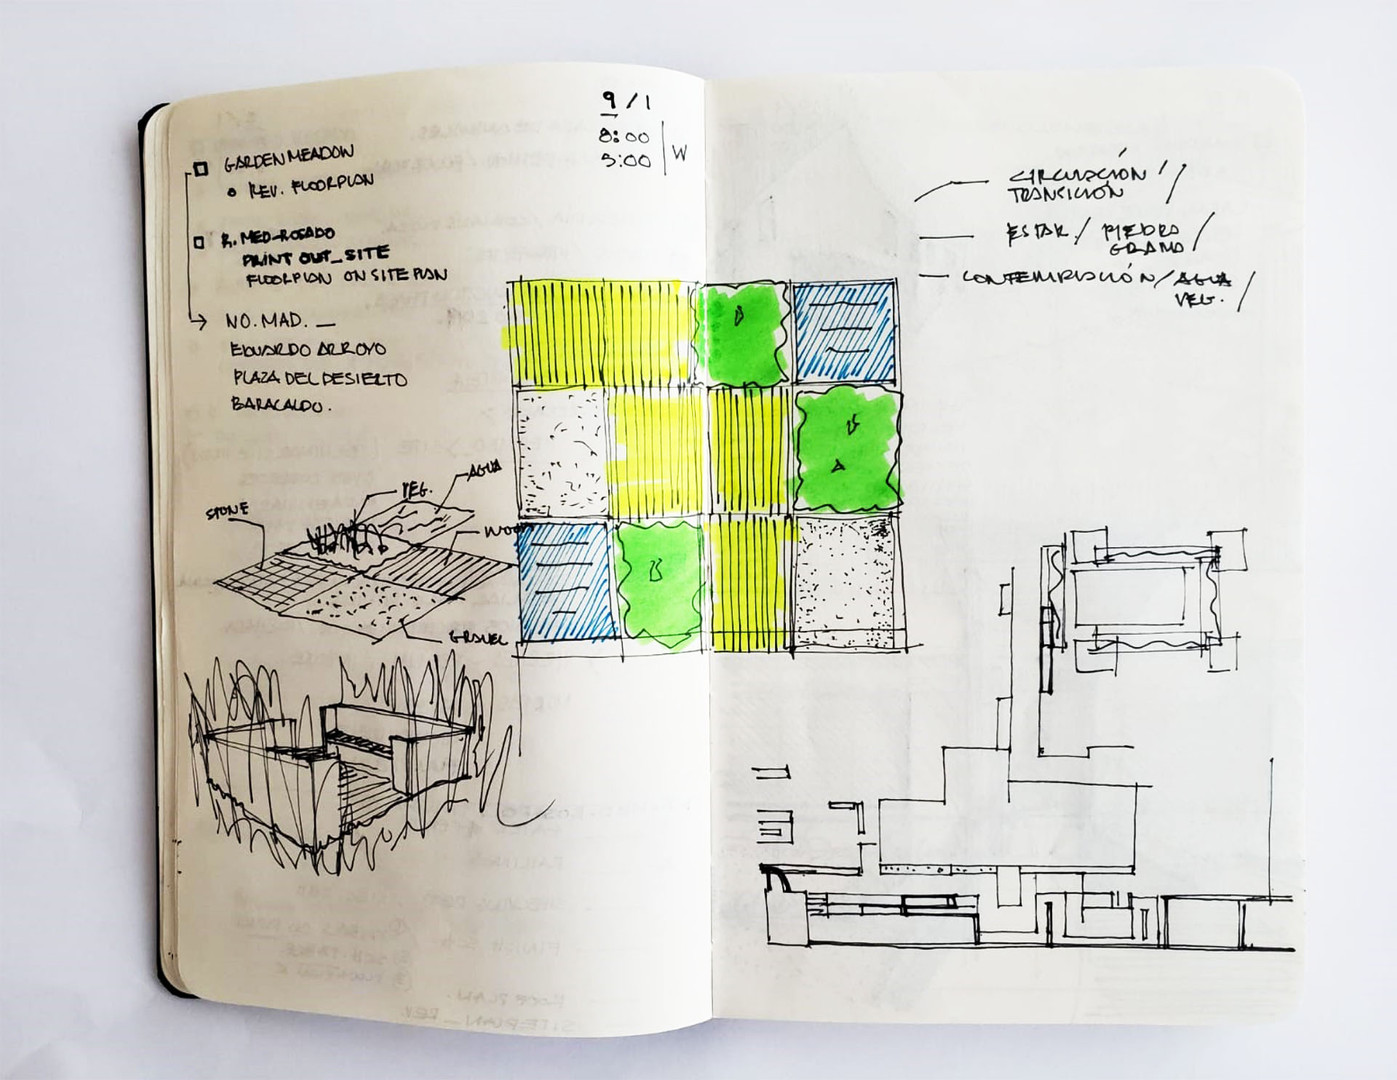 Sketch by Arq. Gómez